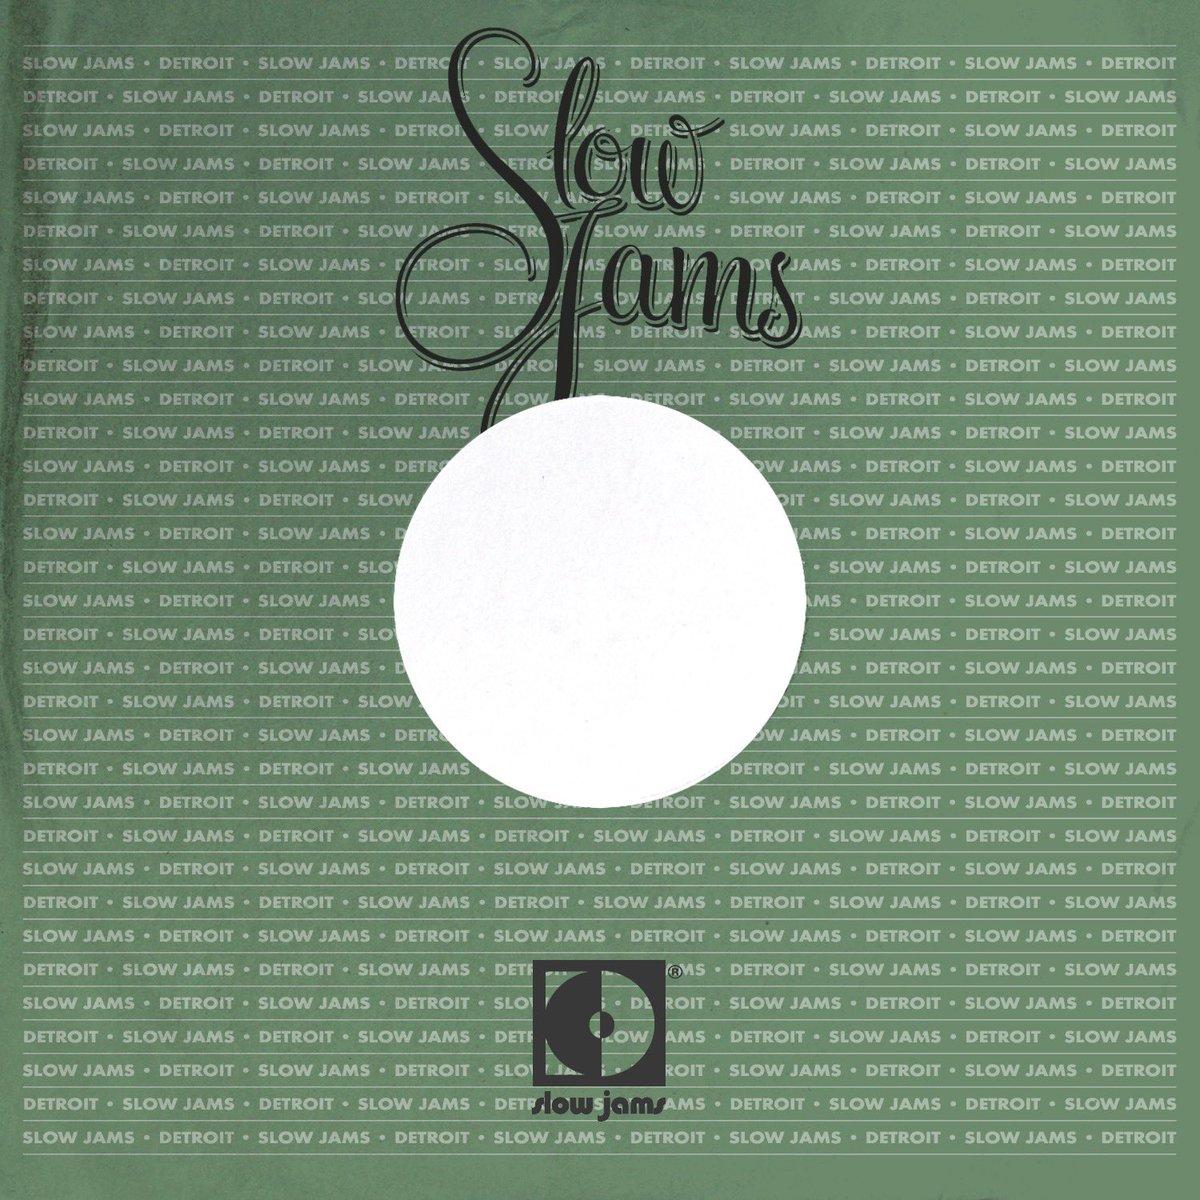 MON 4/22 - Slow Jams wsg Pirahnahead + Erno & Eastside / 21+, free, doors @ 9, music from 10p-2a  #Detroit #Motown #MotorCity #WayneState #CCSDetroit #SlowJams #RnB #Funk #Soul #RareGroove #Michigan